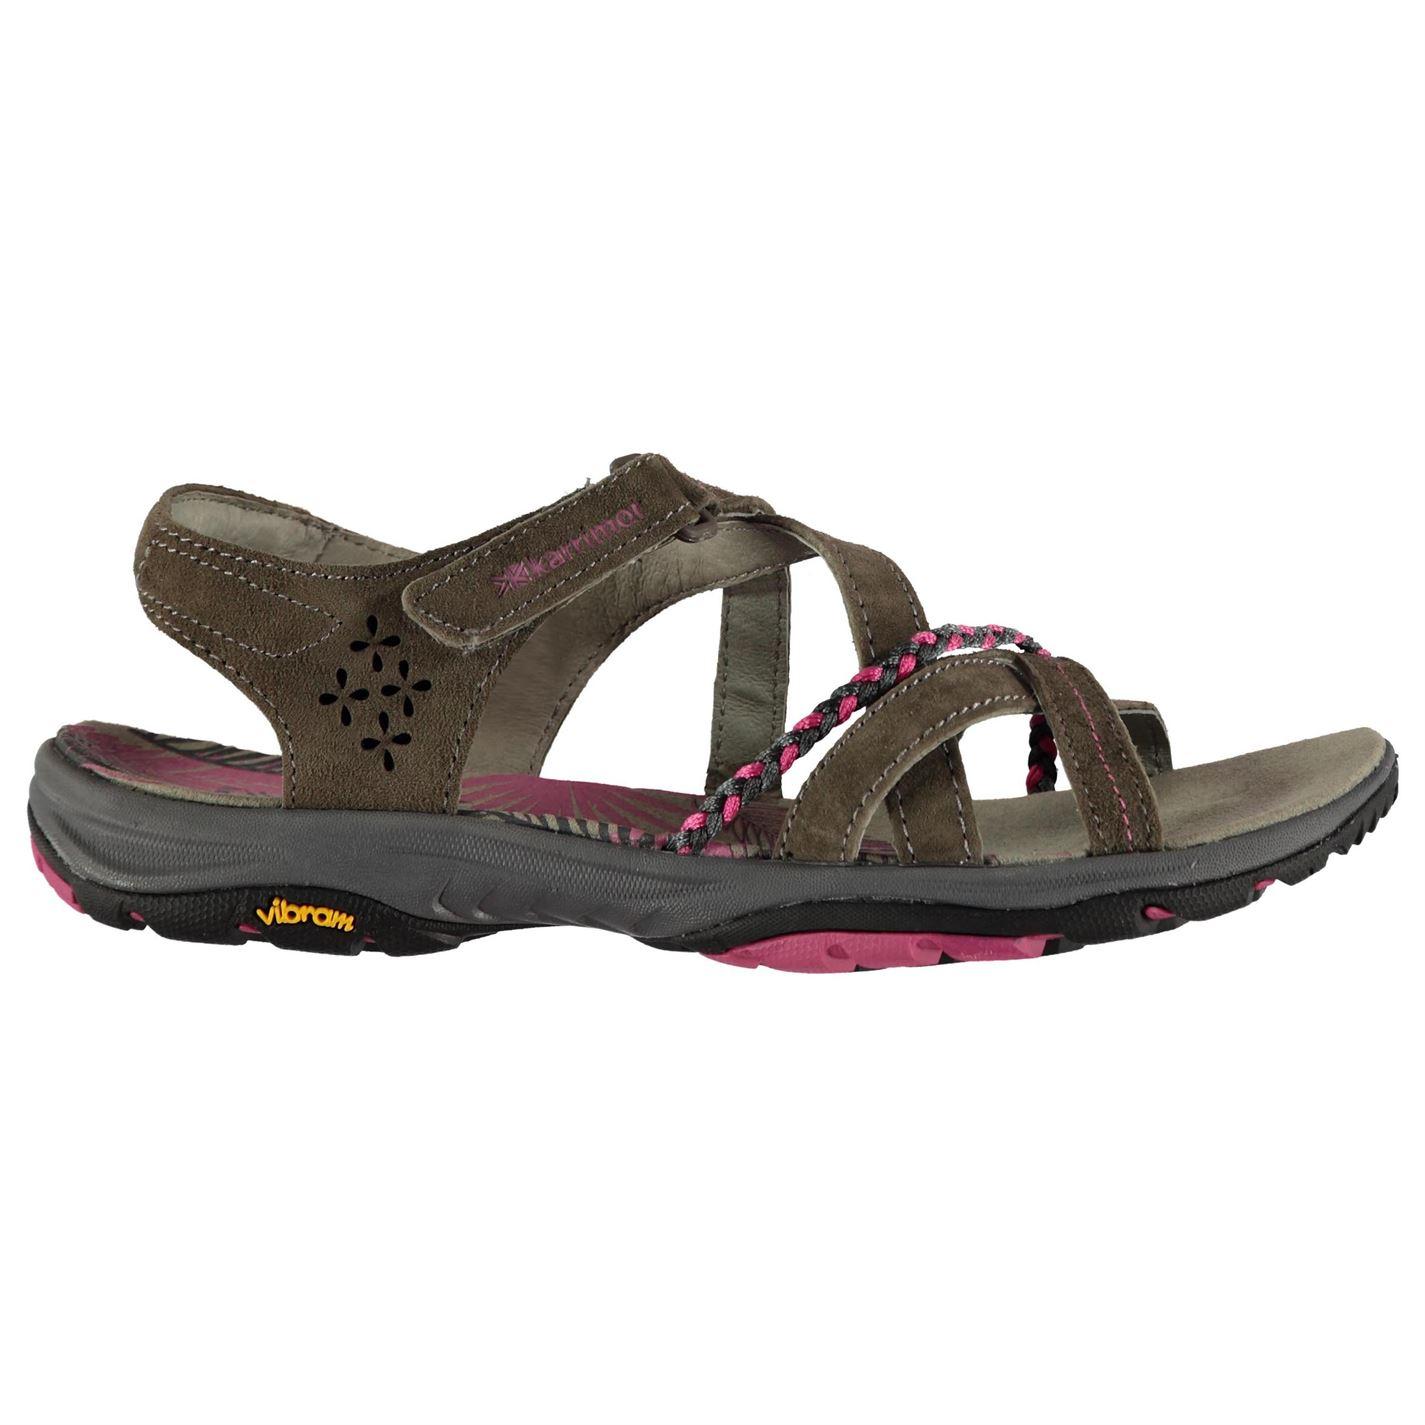 9b430cbc1681 Sandale Karrimor Tobago Ladies Sandals Siva - Jeftinije.hr